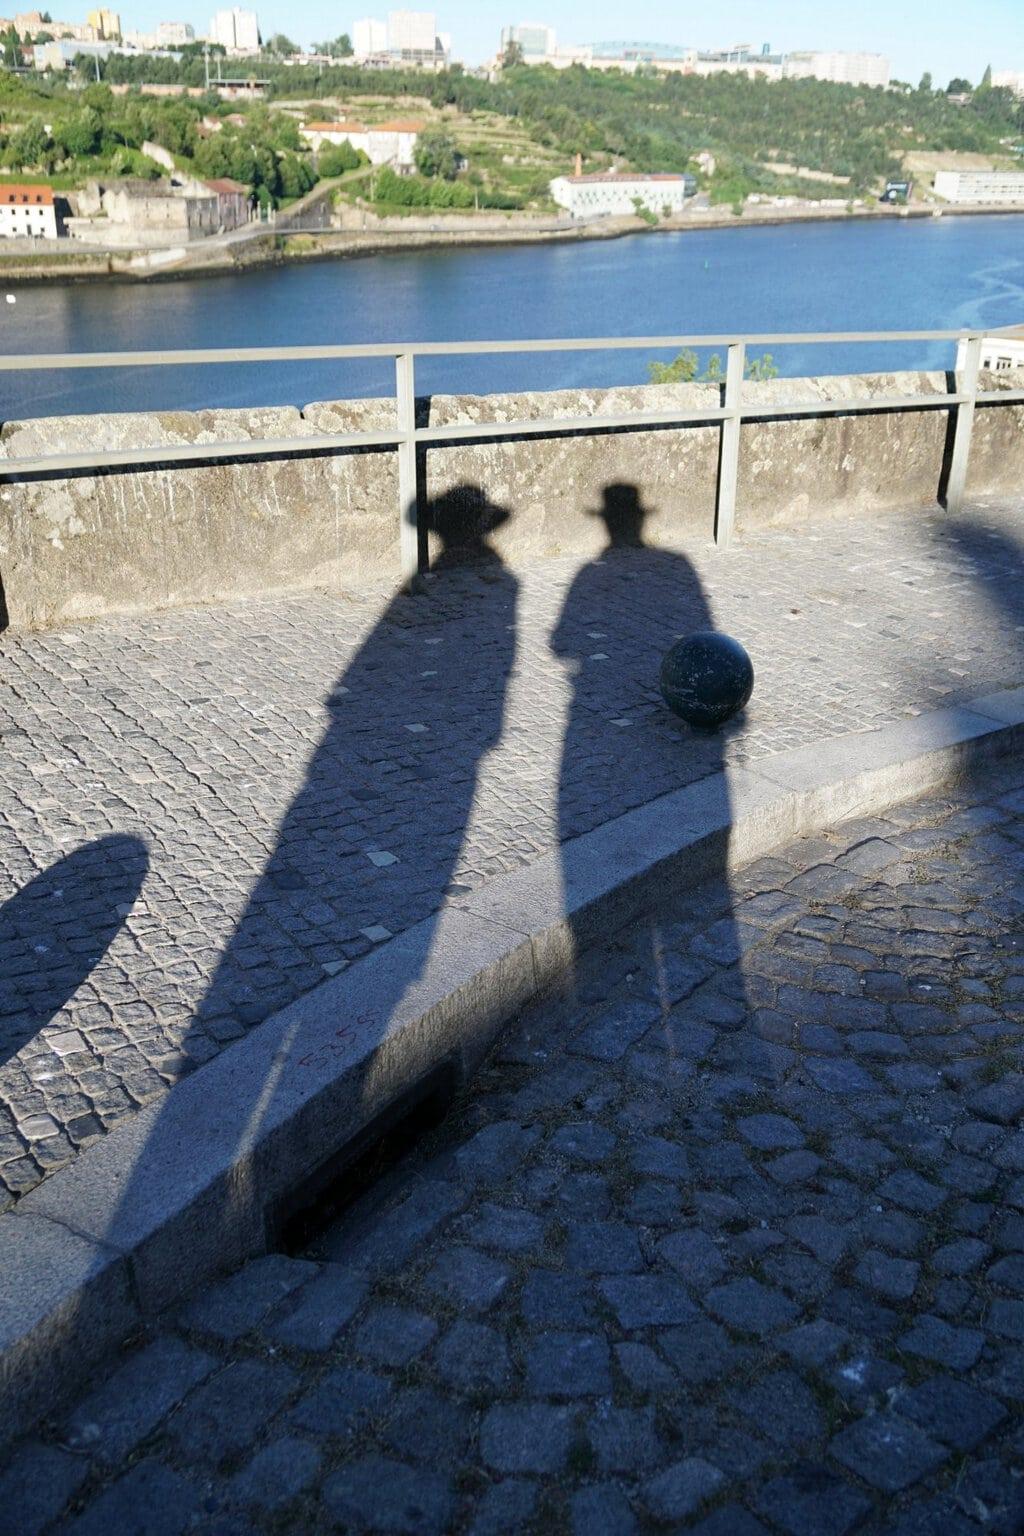 My Camino Português – From Porto to Labruge